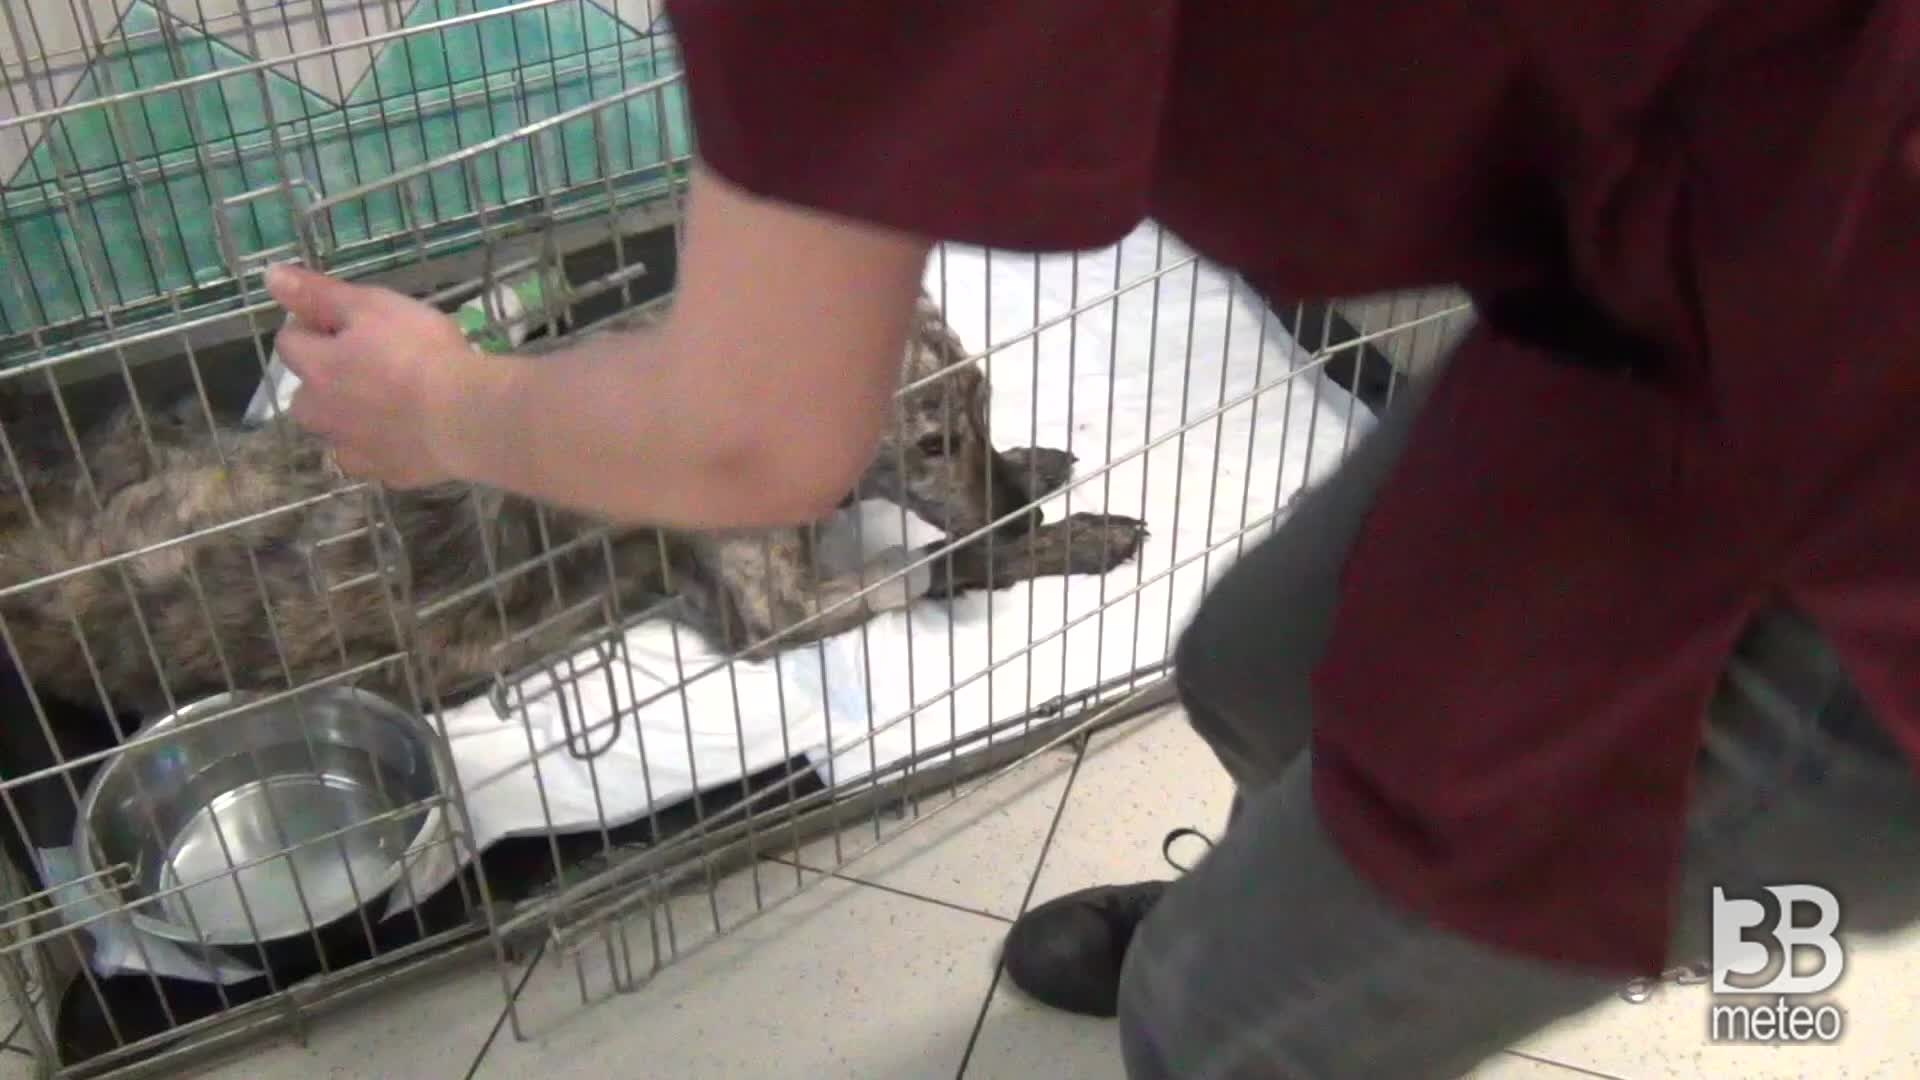 Incendi, cure ai cani feriti: gravi ustioni